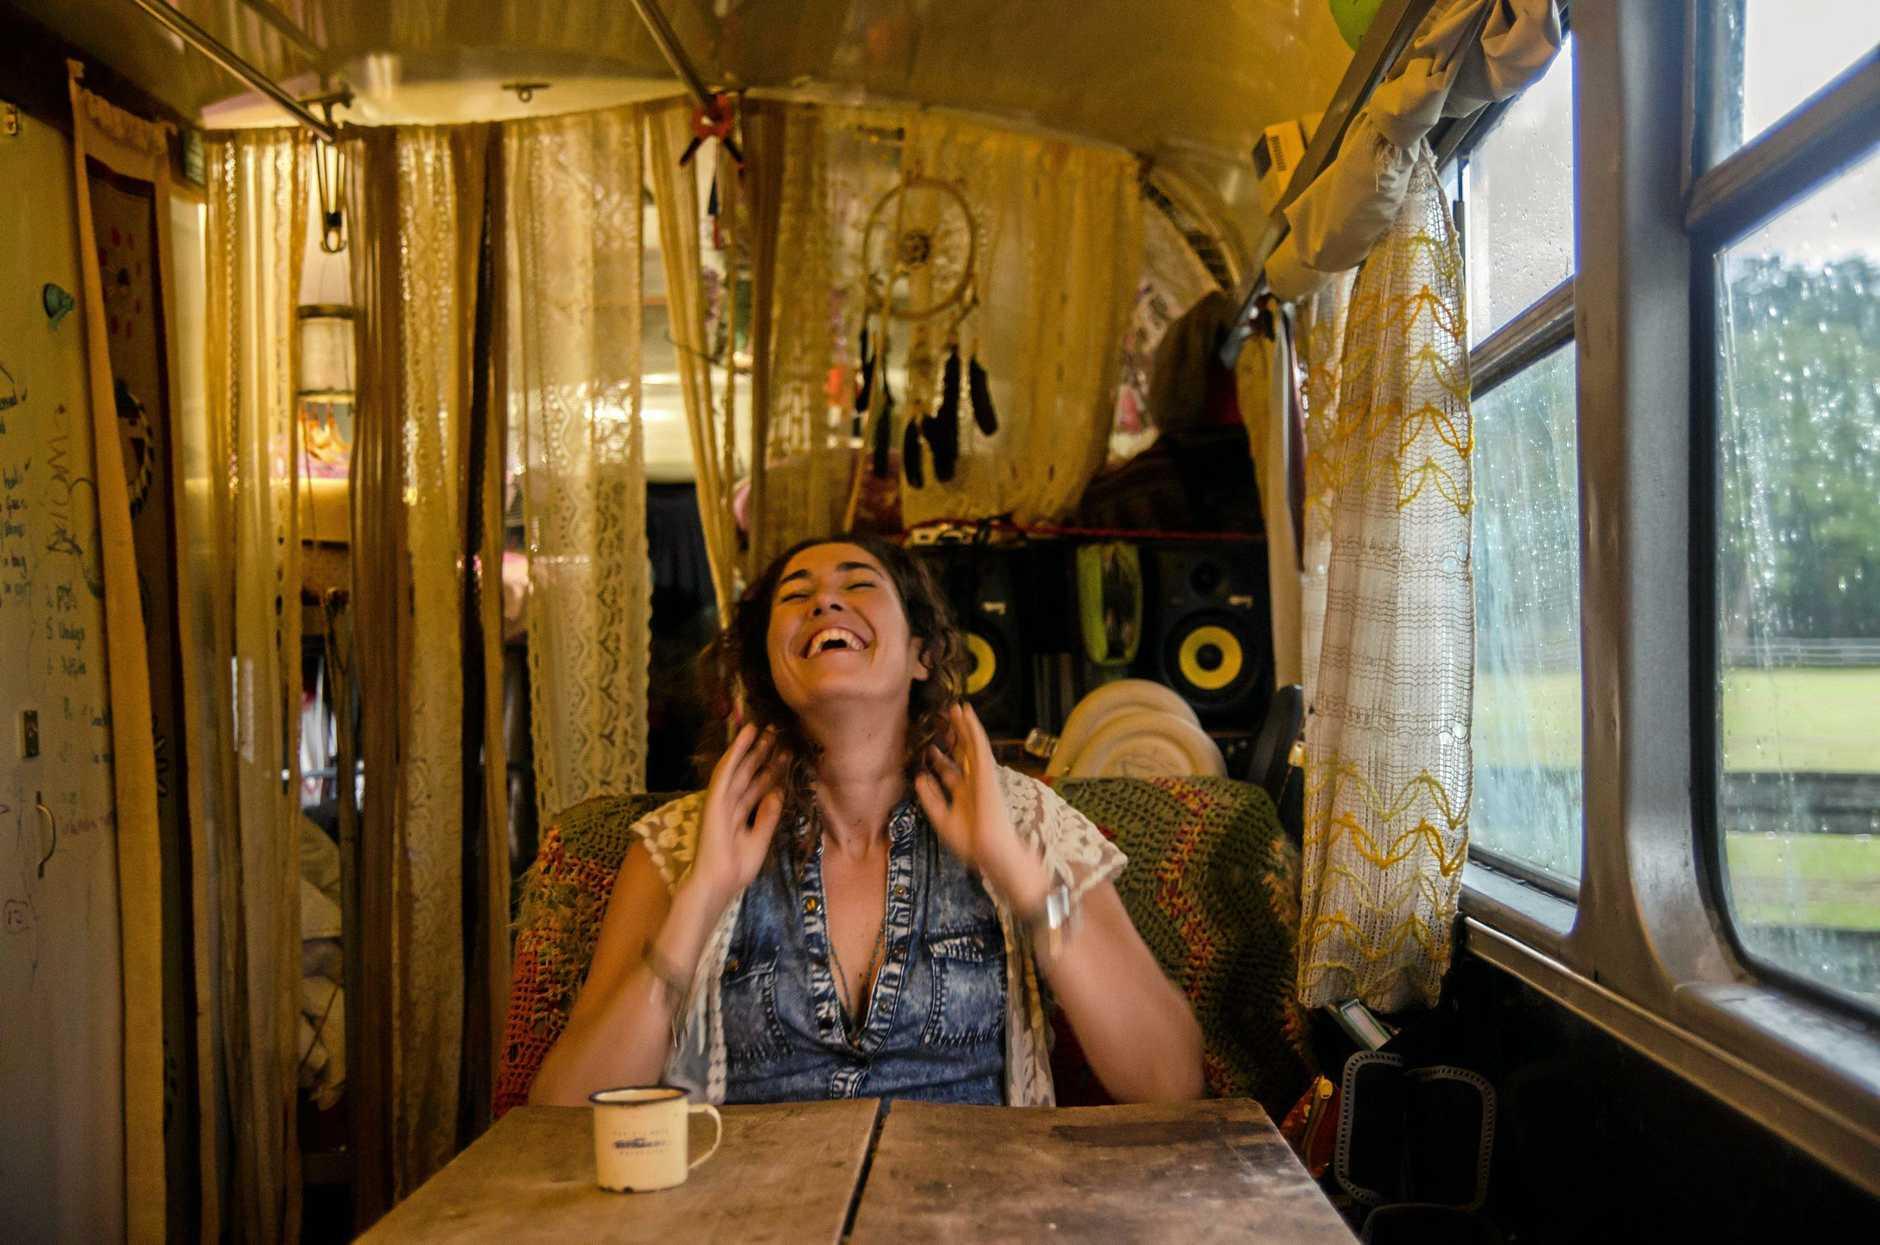 SHOW: Irish-Australian musician Aine Tyrrell is releasing a new album.